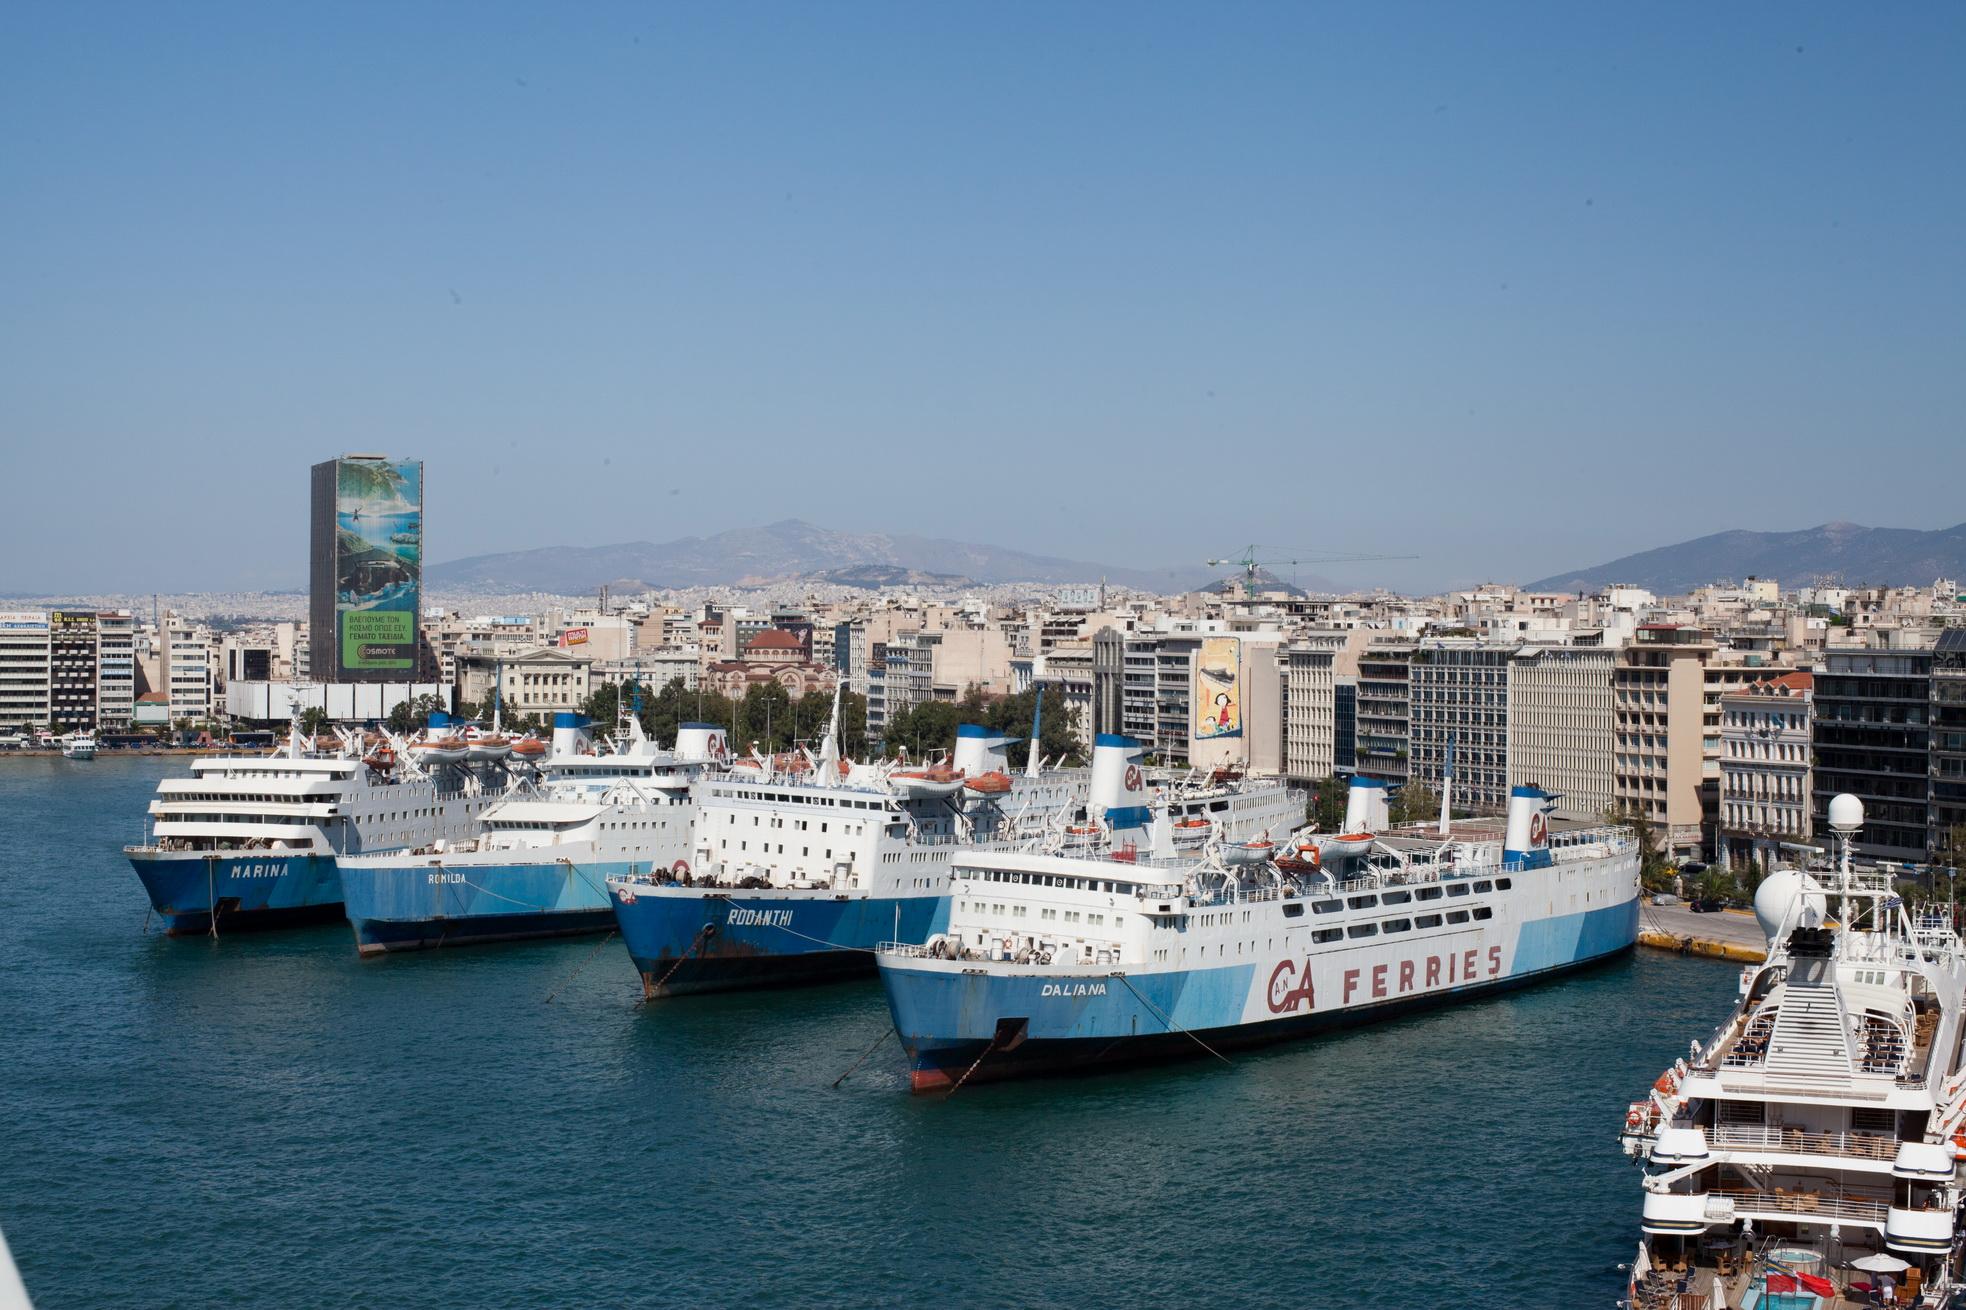 MS Daliana IMO 7007265 Rodanthi Romilda and Marina GA Ferries docked Piraeus Port of Athens Greece 01